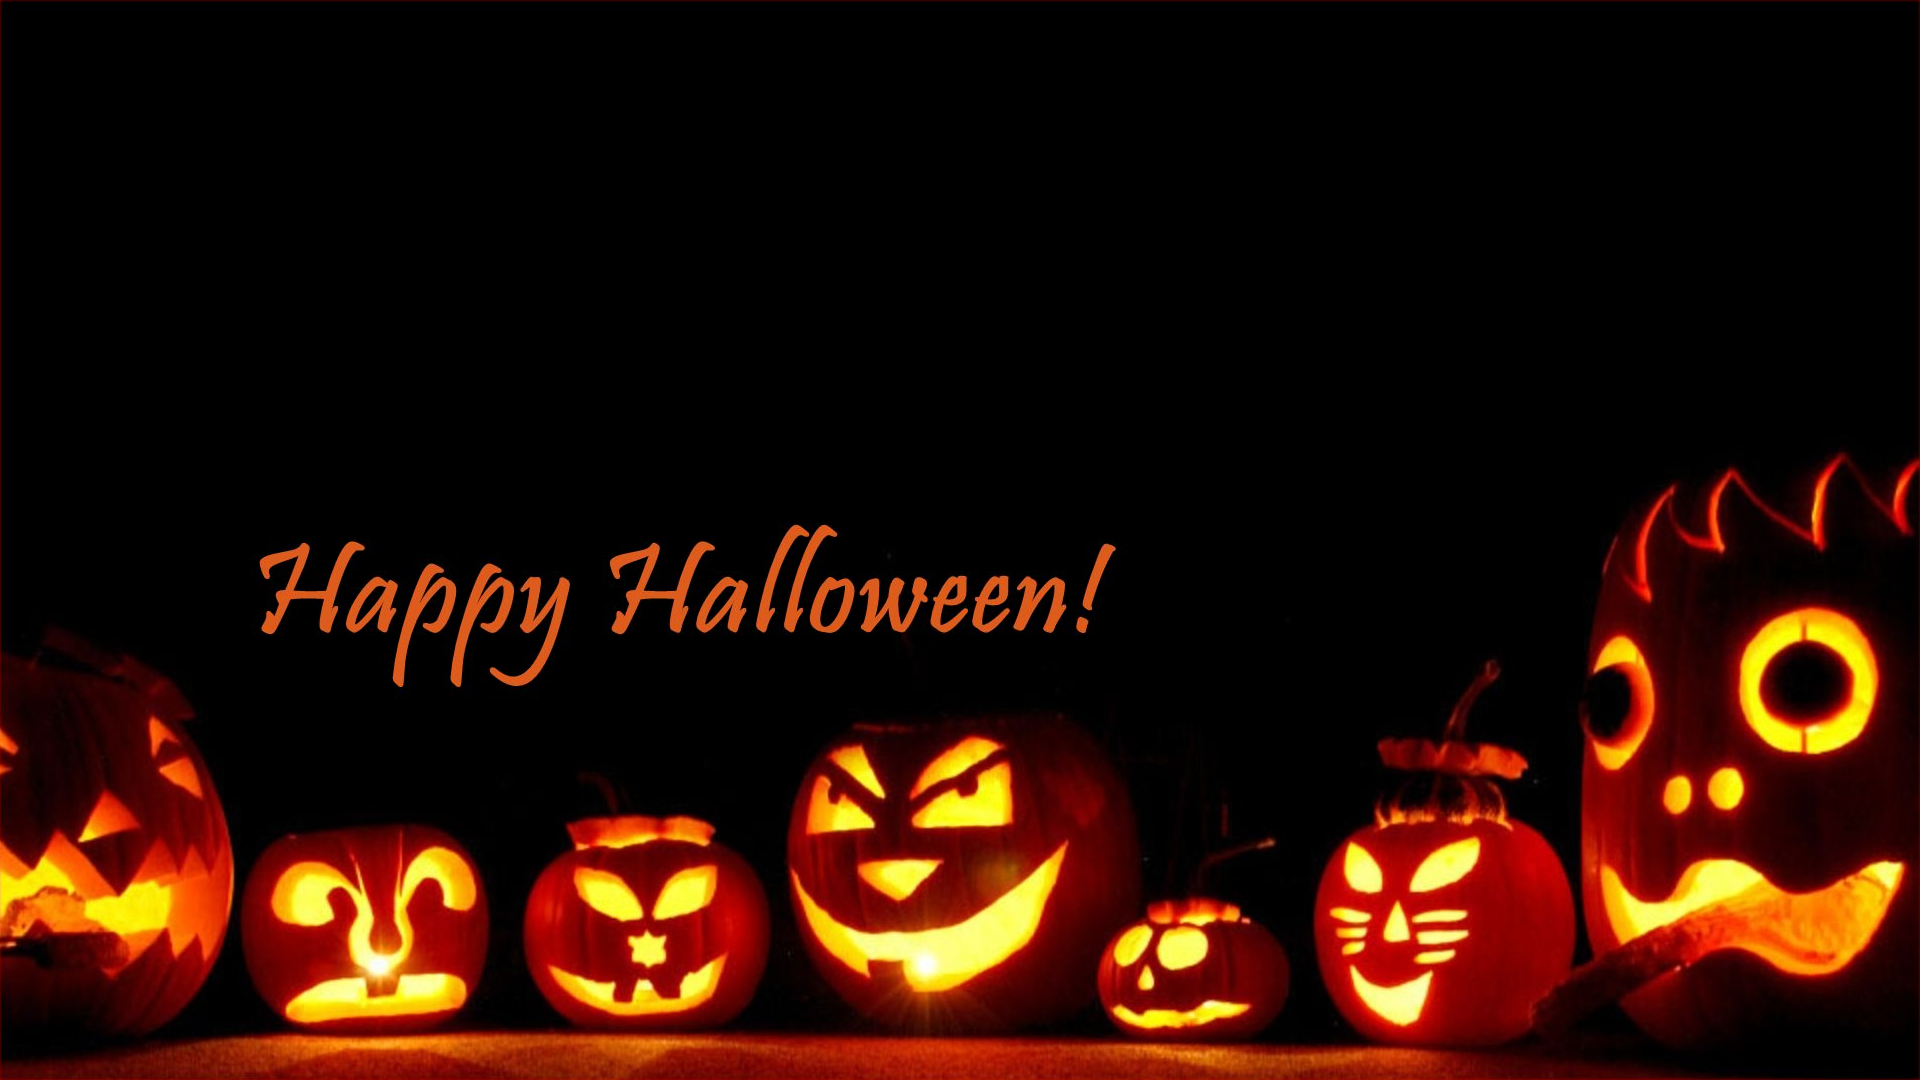 Holiday Halloween Holiday Happy Halloween Jack O Lantern Wallpaper Halloween Images Free Halloween Images Halloween Backgrounds